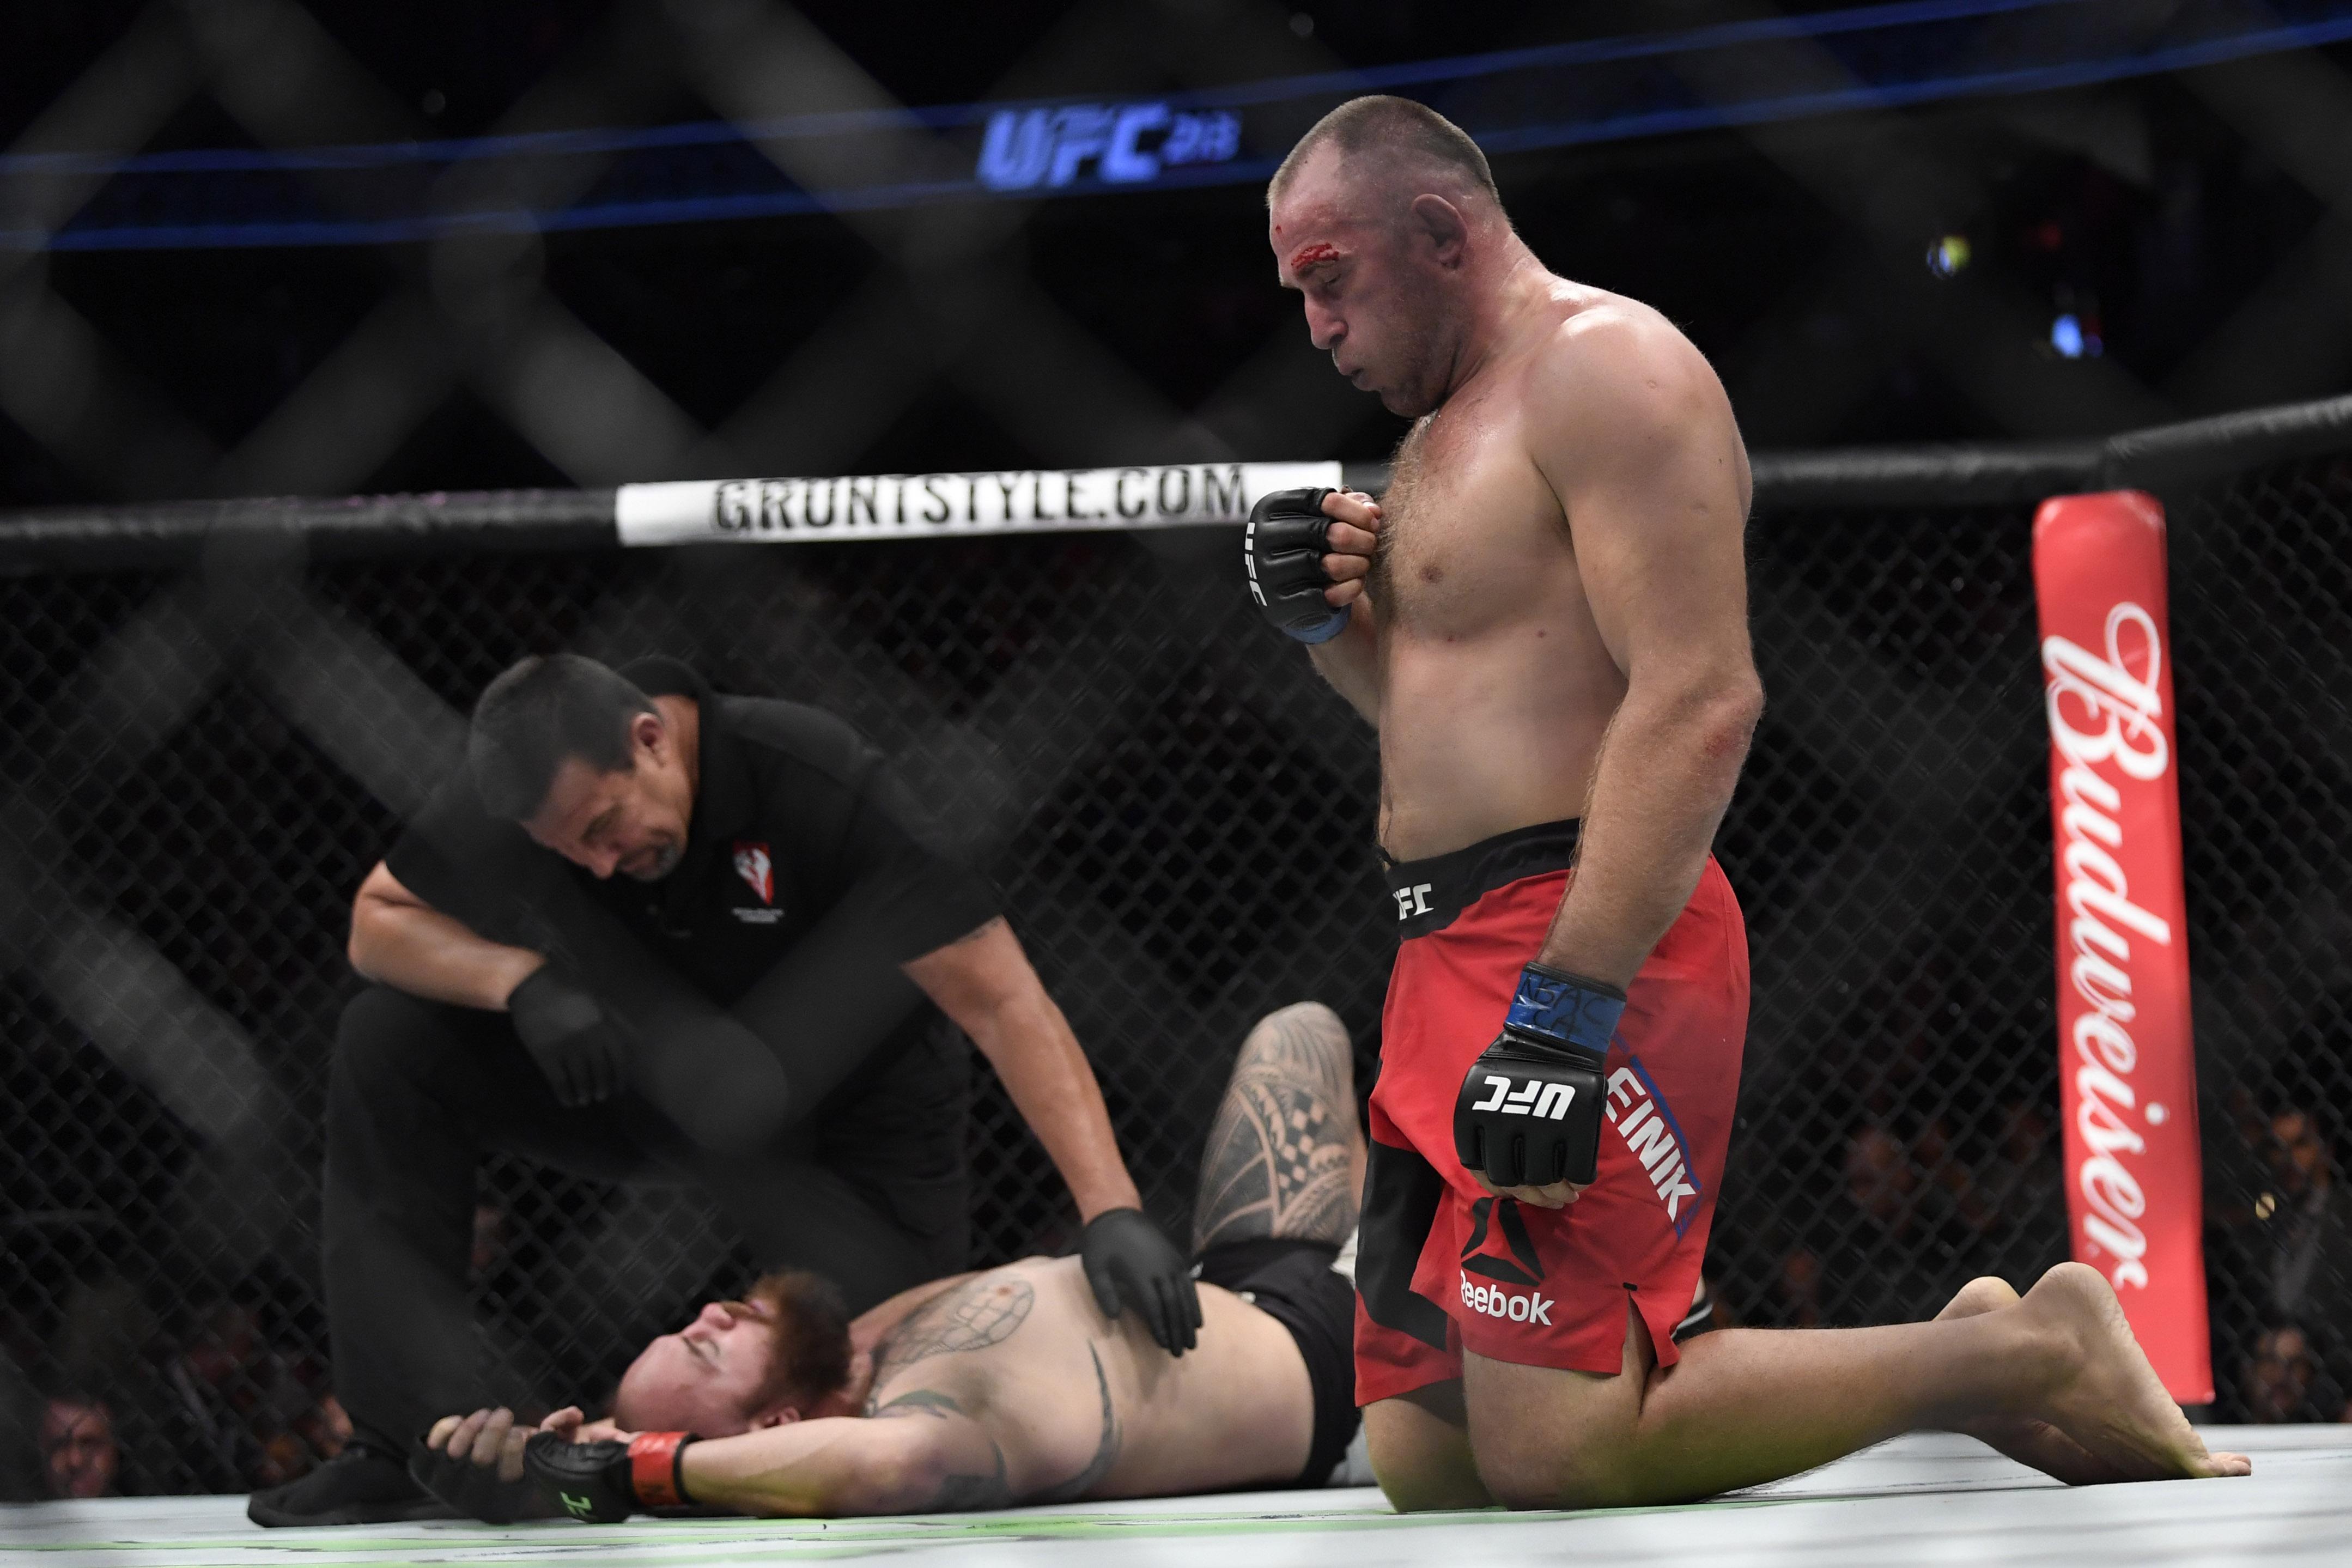 MMA: UFC 213-Browne vs Oleinik